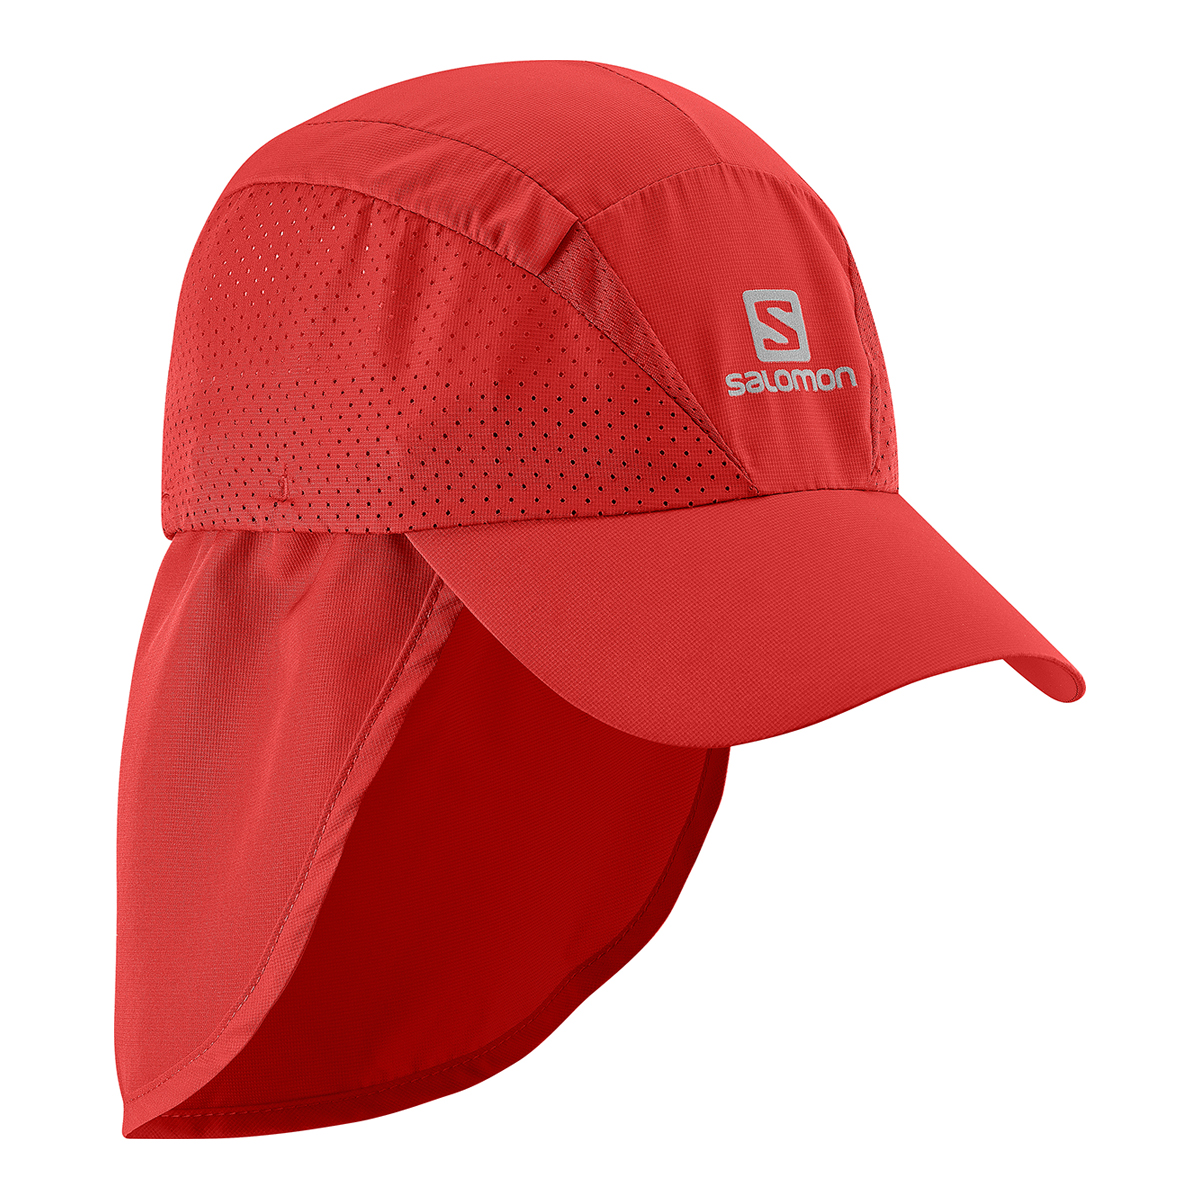 Salomon Xa Cap Trail Running Accessories Epictv Shop